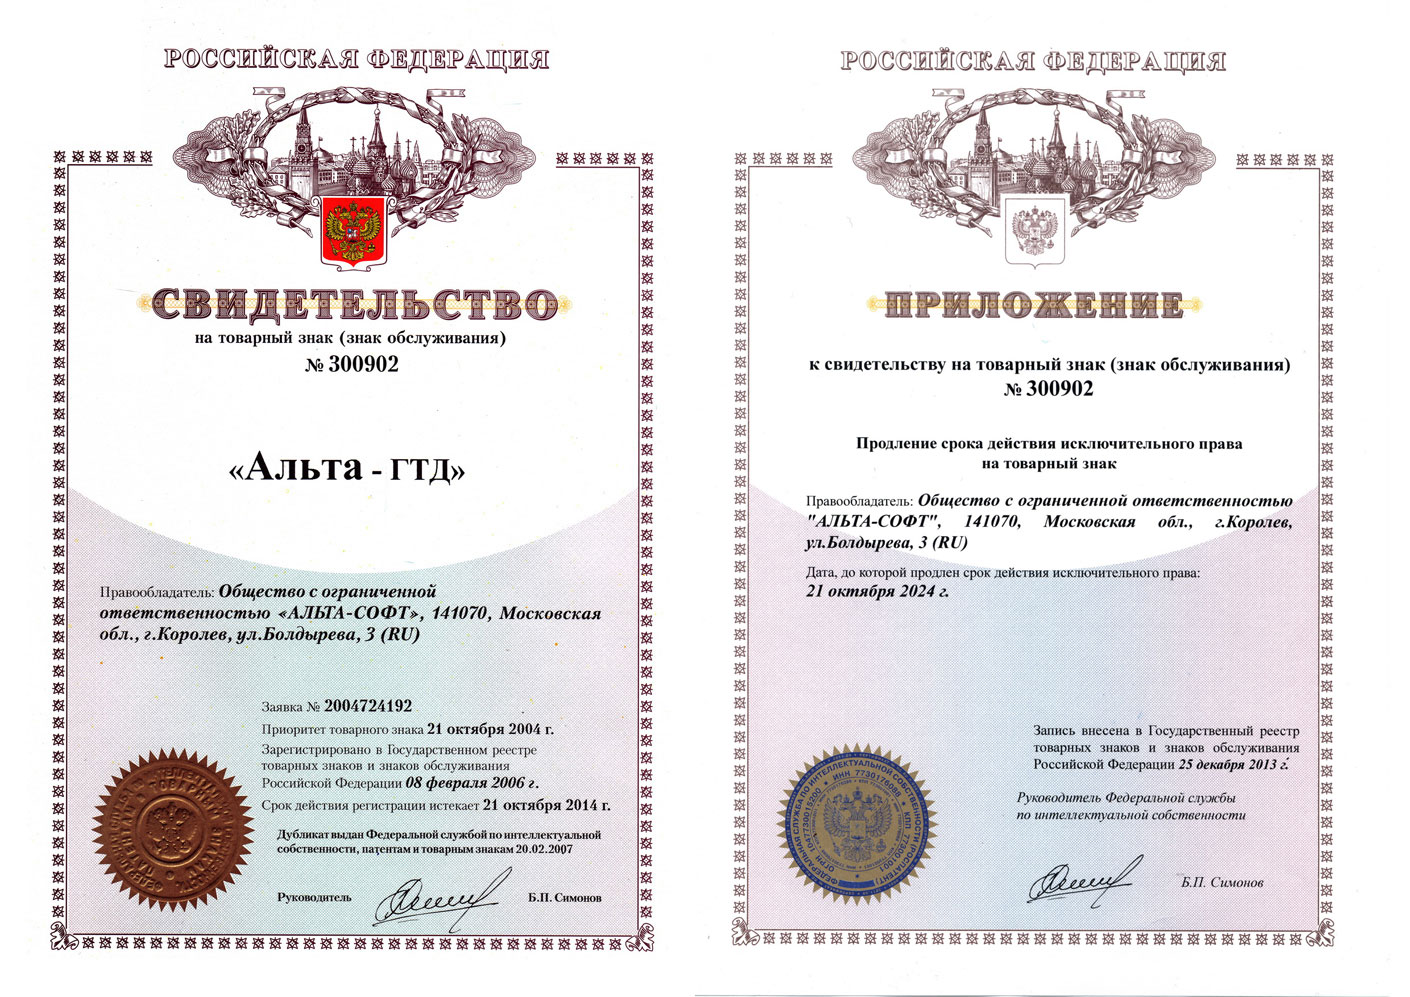 Регистрация коллективного товарного знака